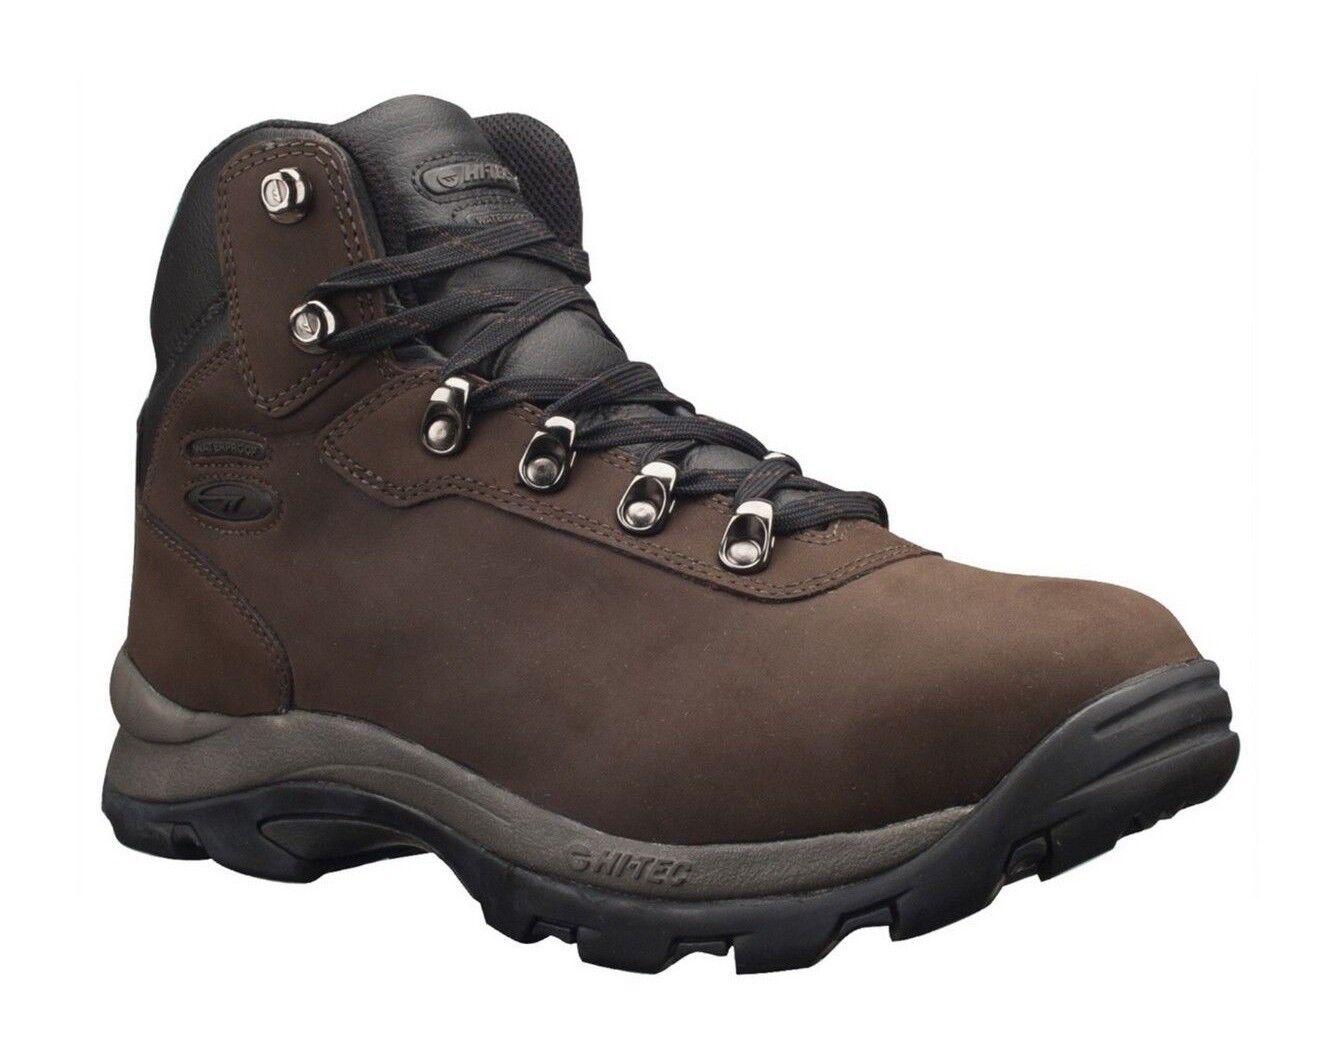 Hi-Tec Altitude IV 41100 Para Hombre De Cuero Chocolate Oscuro Impermeable botas Senderismo